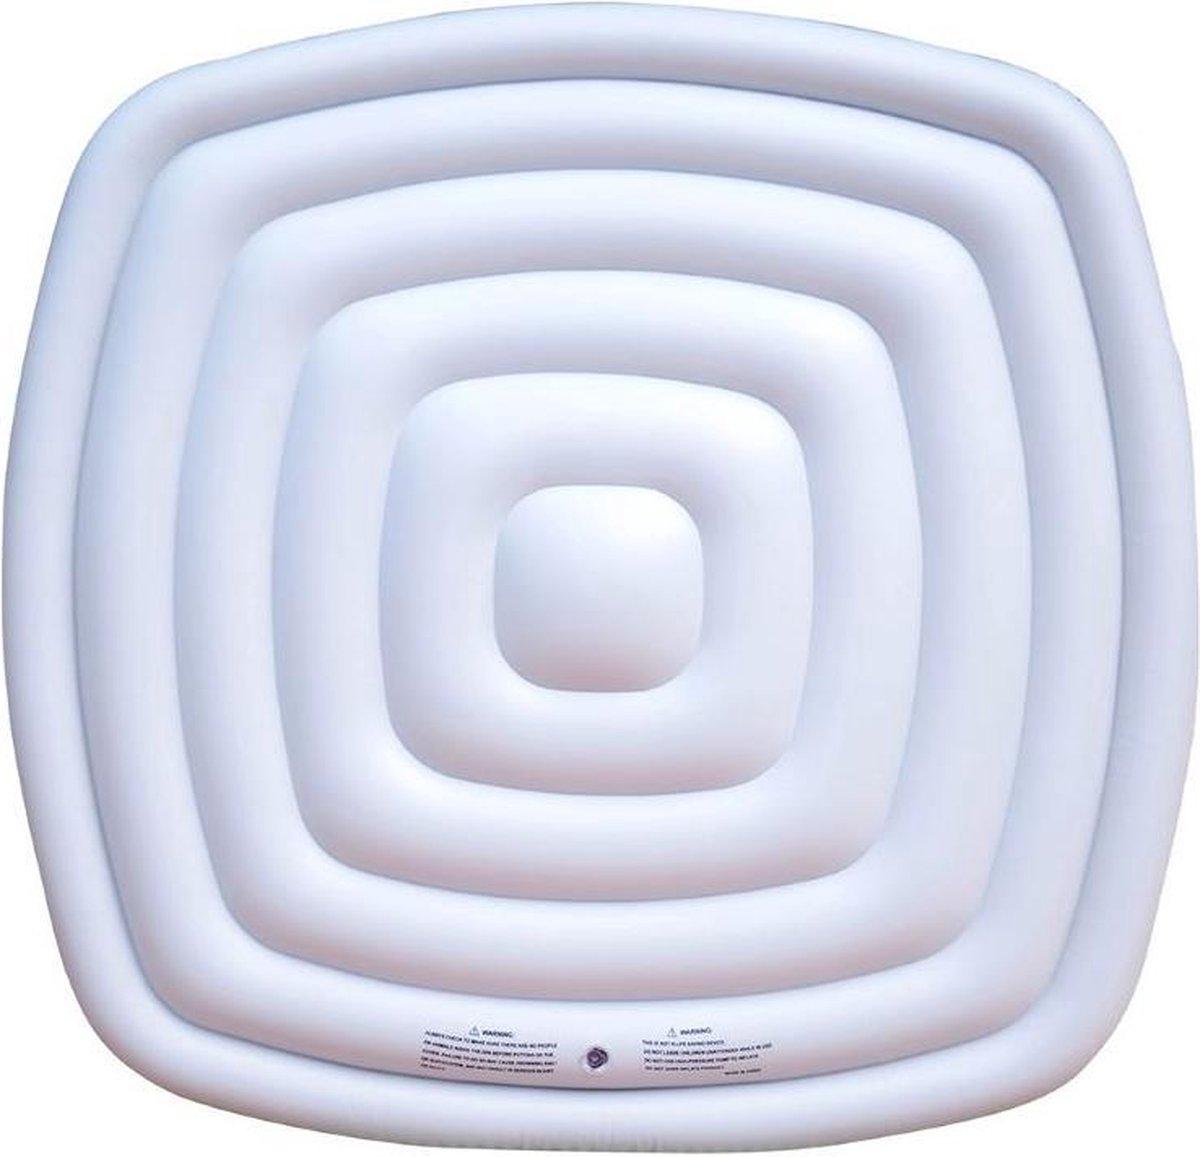 Opblaasbare isolatie deksel vierkant 4 persoons bubbelbad